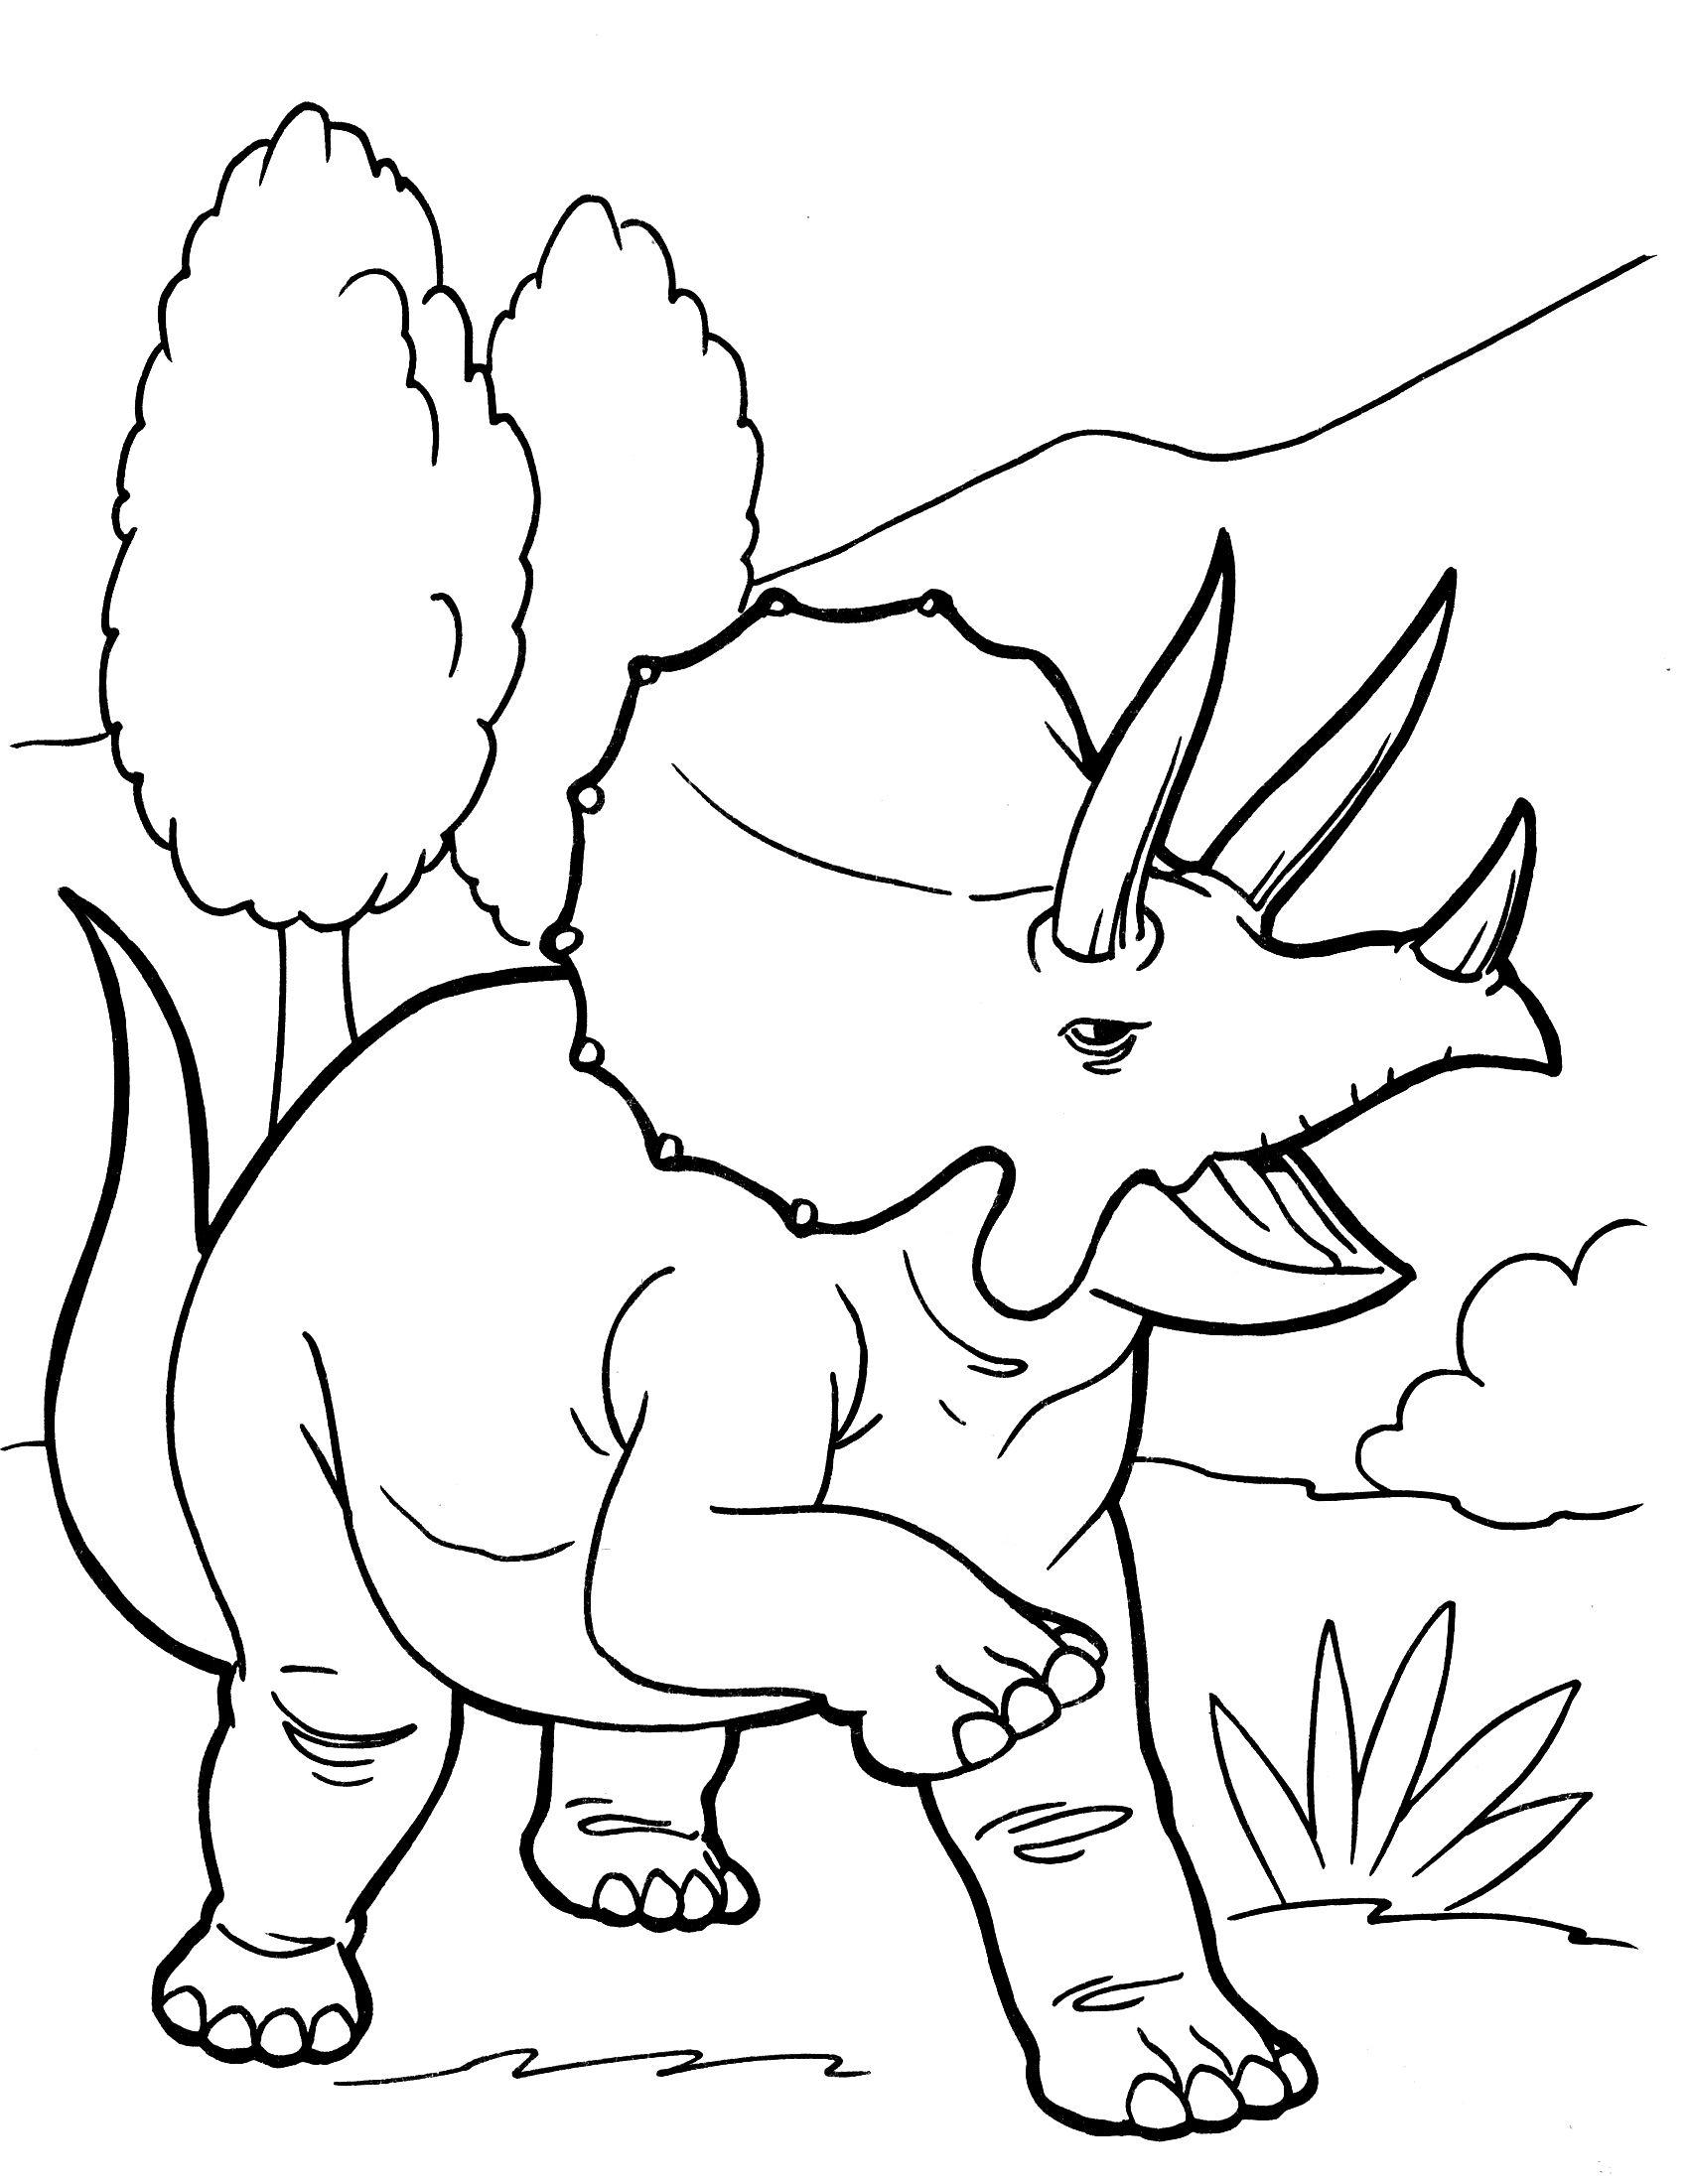 Dinosaur Paintings For Kids